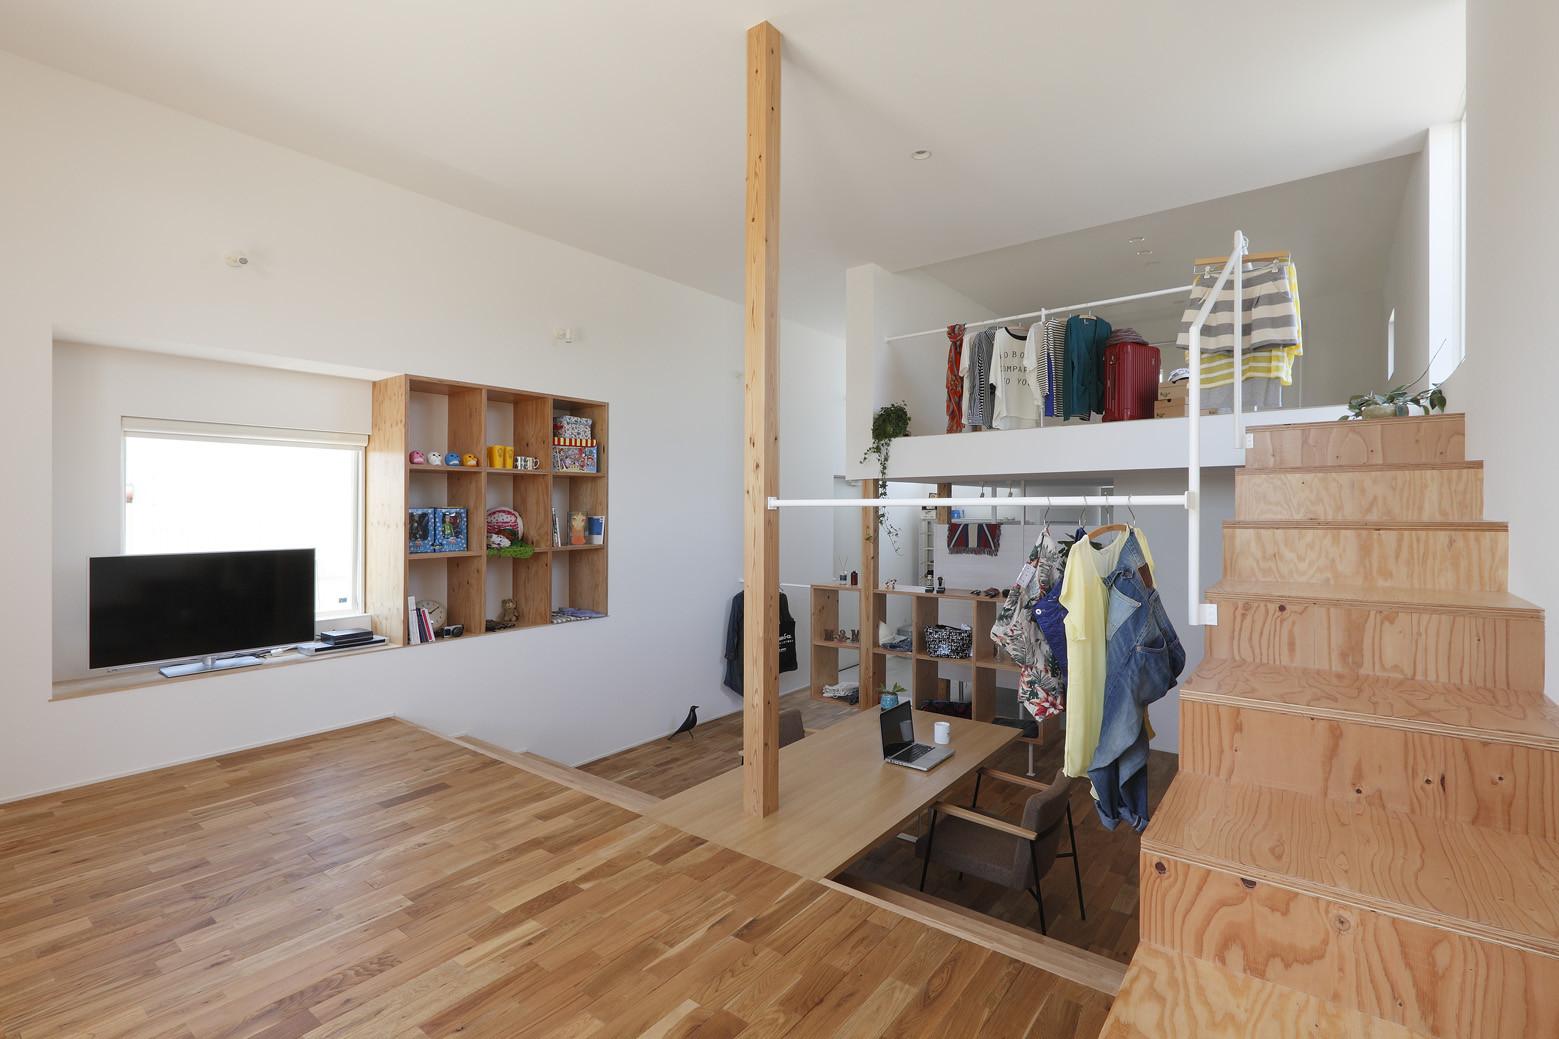 Higashihayashiguchi / ALTS Design Office, Courtesy of ALTS Design Office